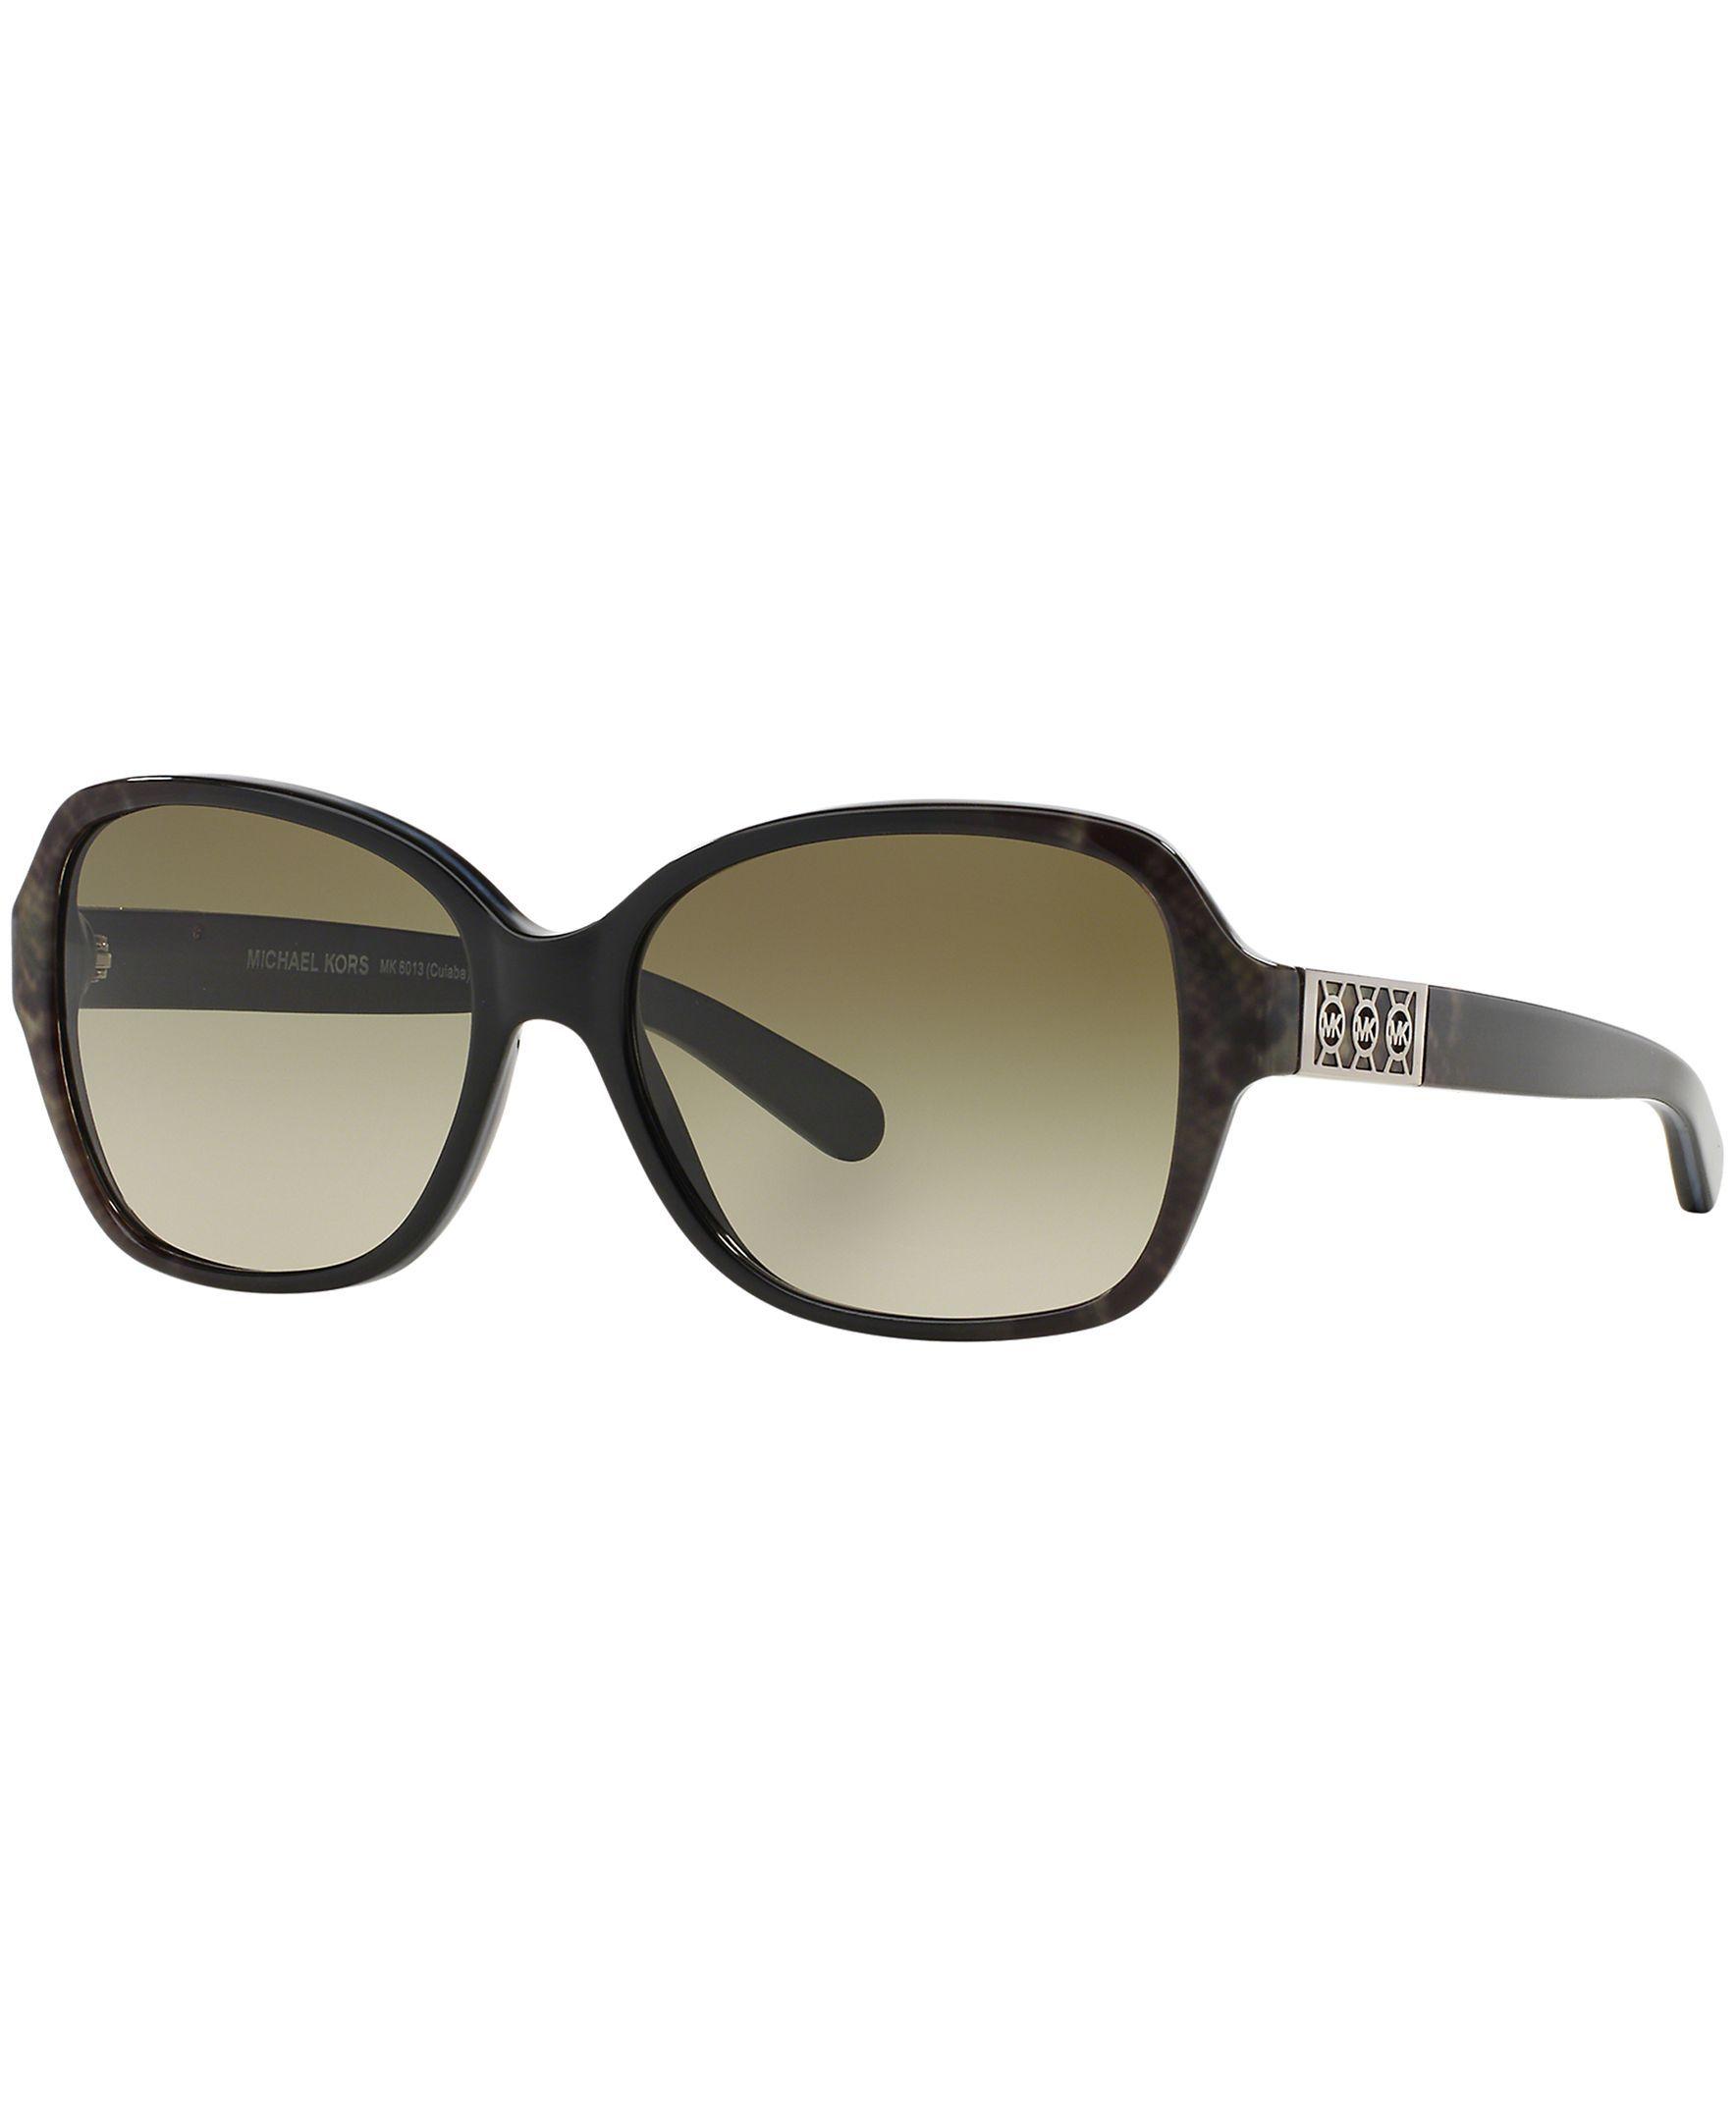 Michael Kors Sunglasses, MK6013 57 Cuiaba